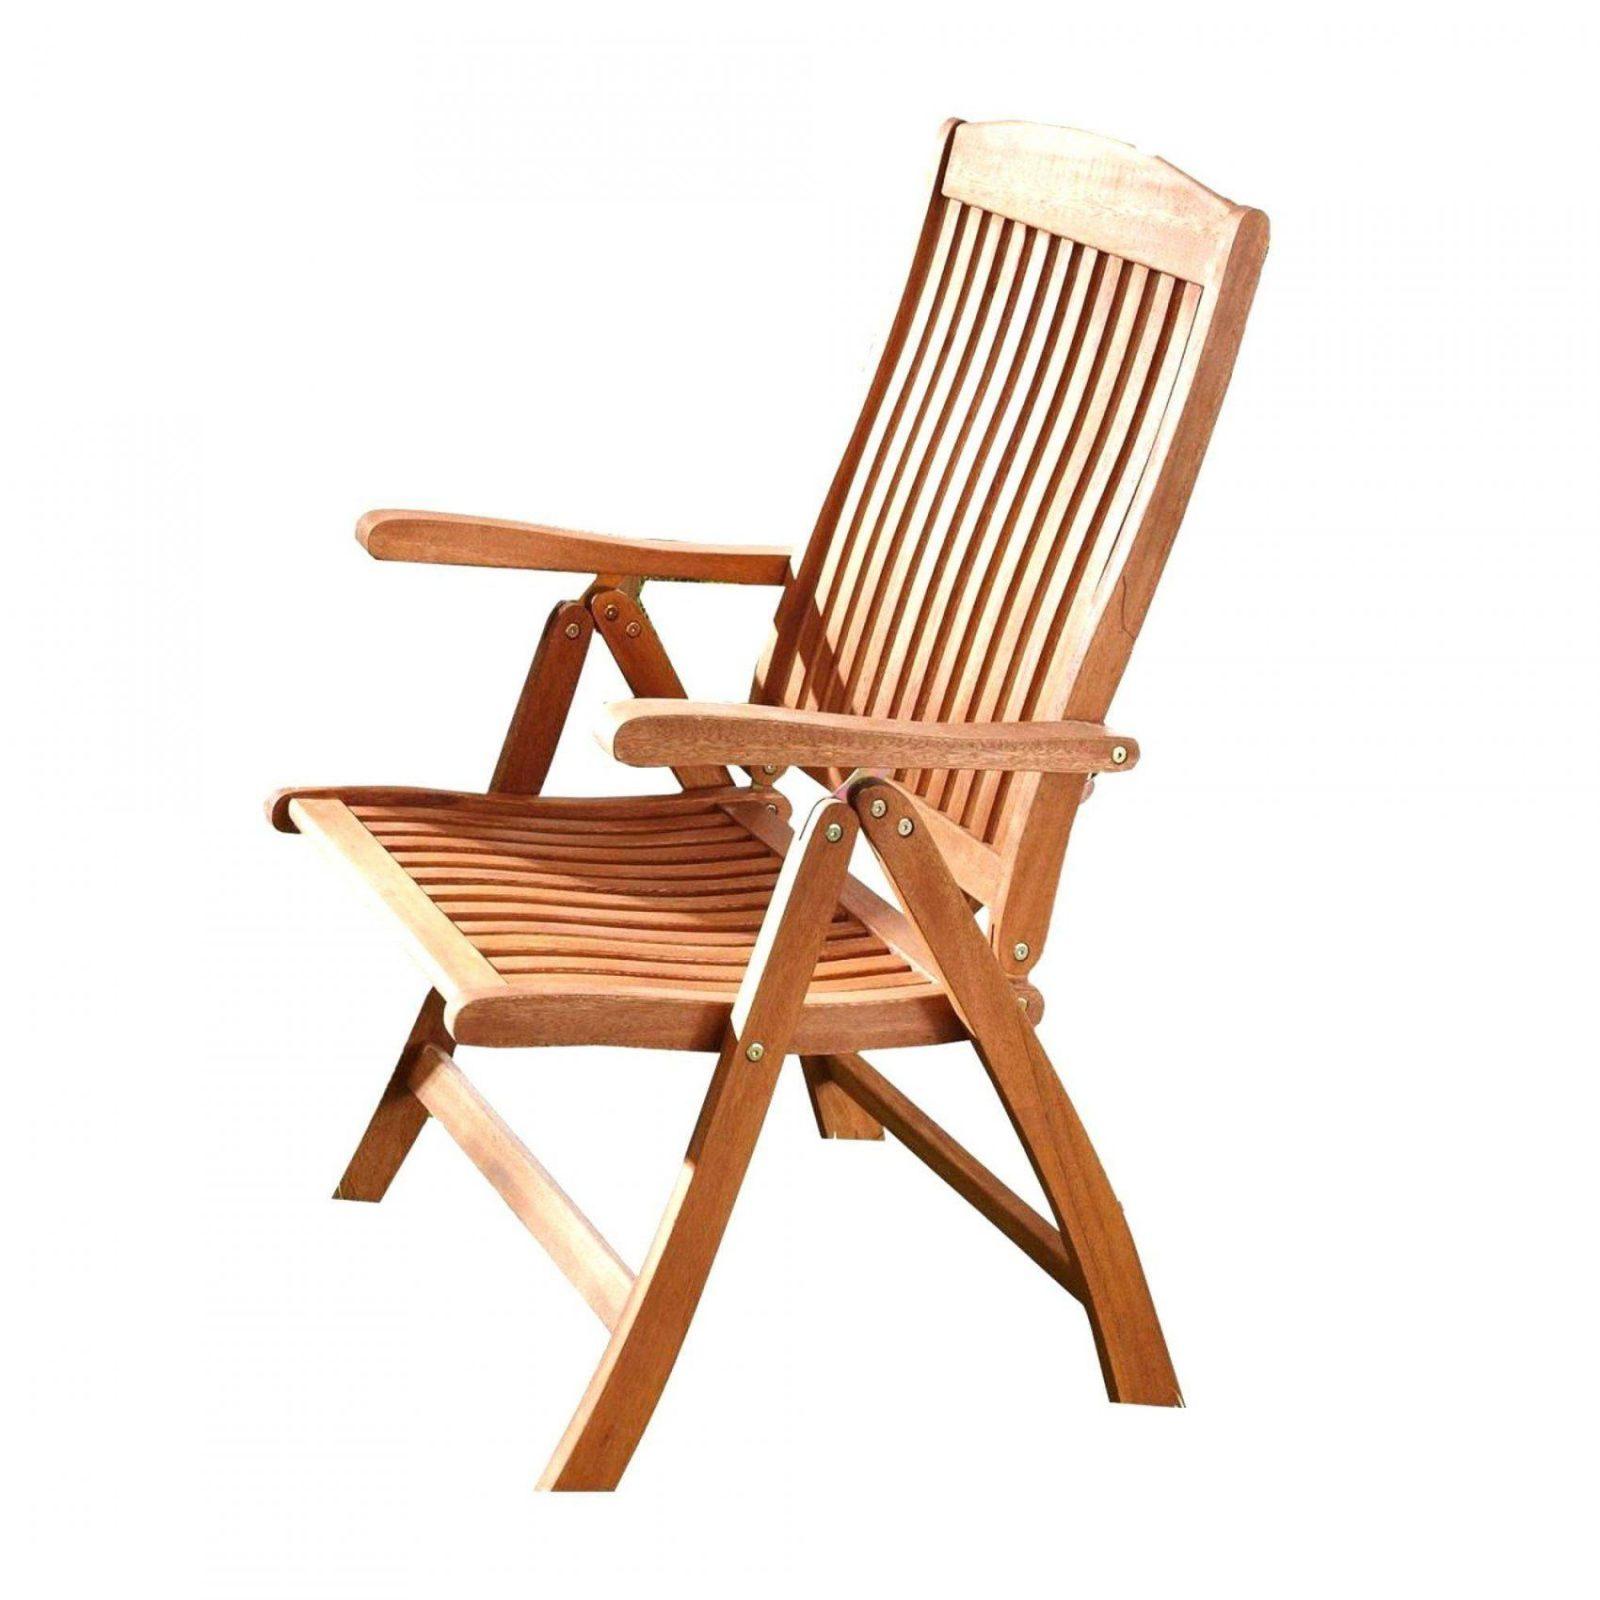 Gartenstuhl Holz Schane Ideen Klappbar Selber Bauen Gartenmobel von Gartenstuhl Holz Selber Bauen Bild